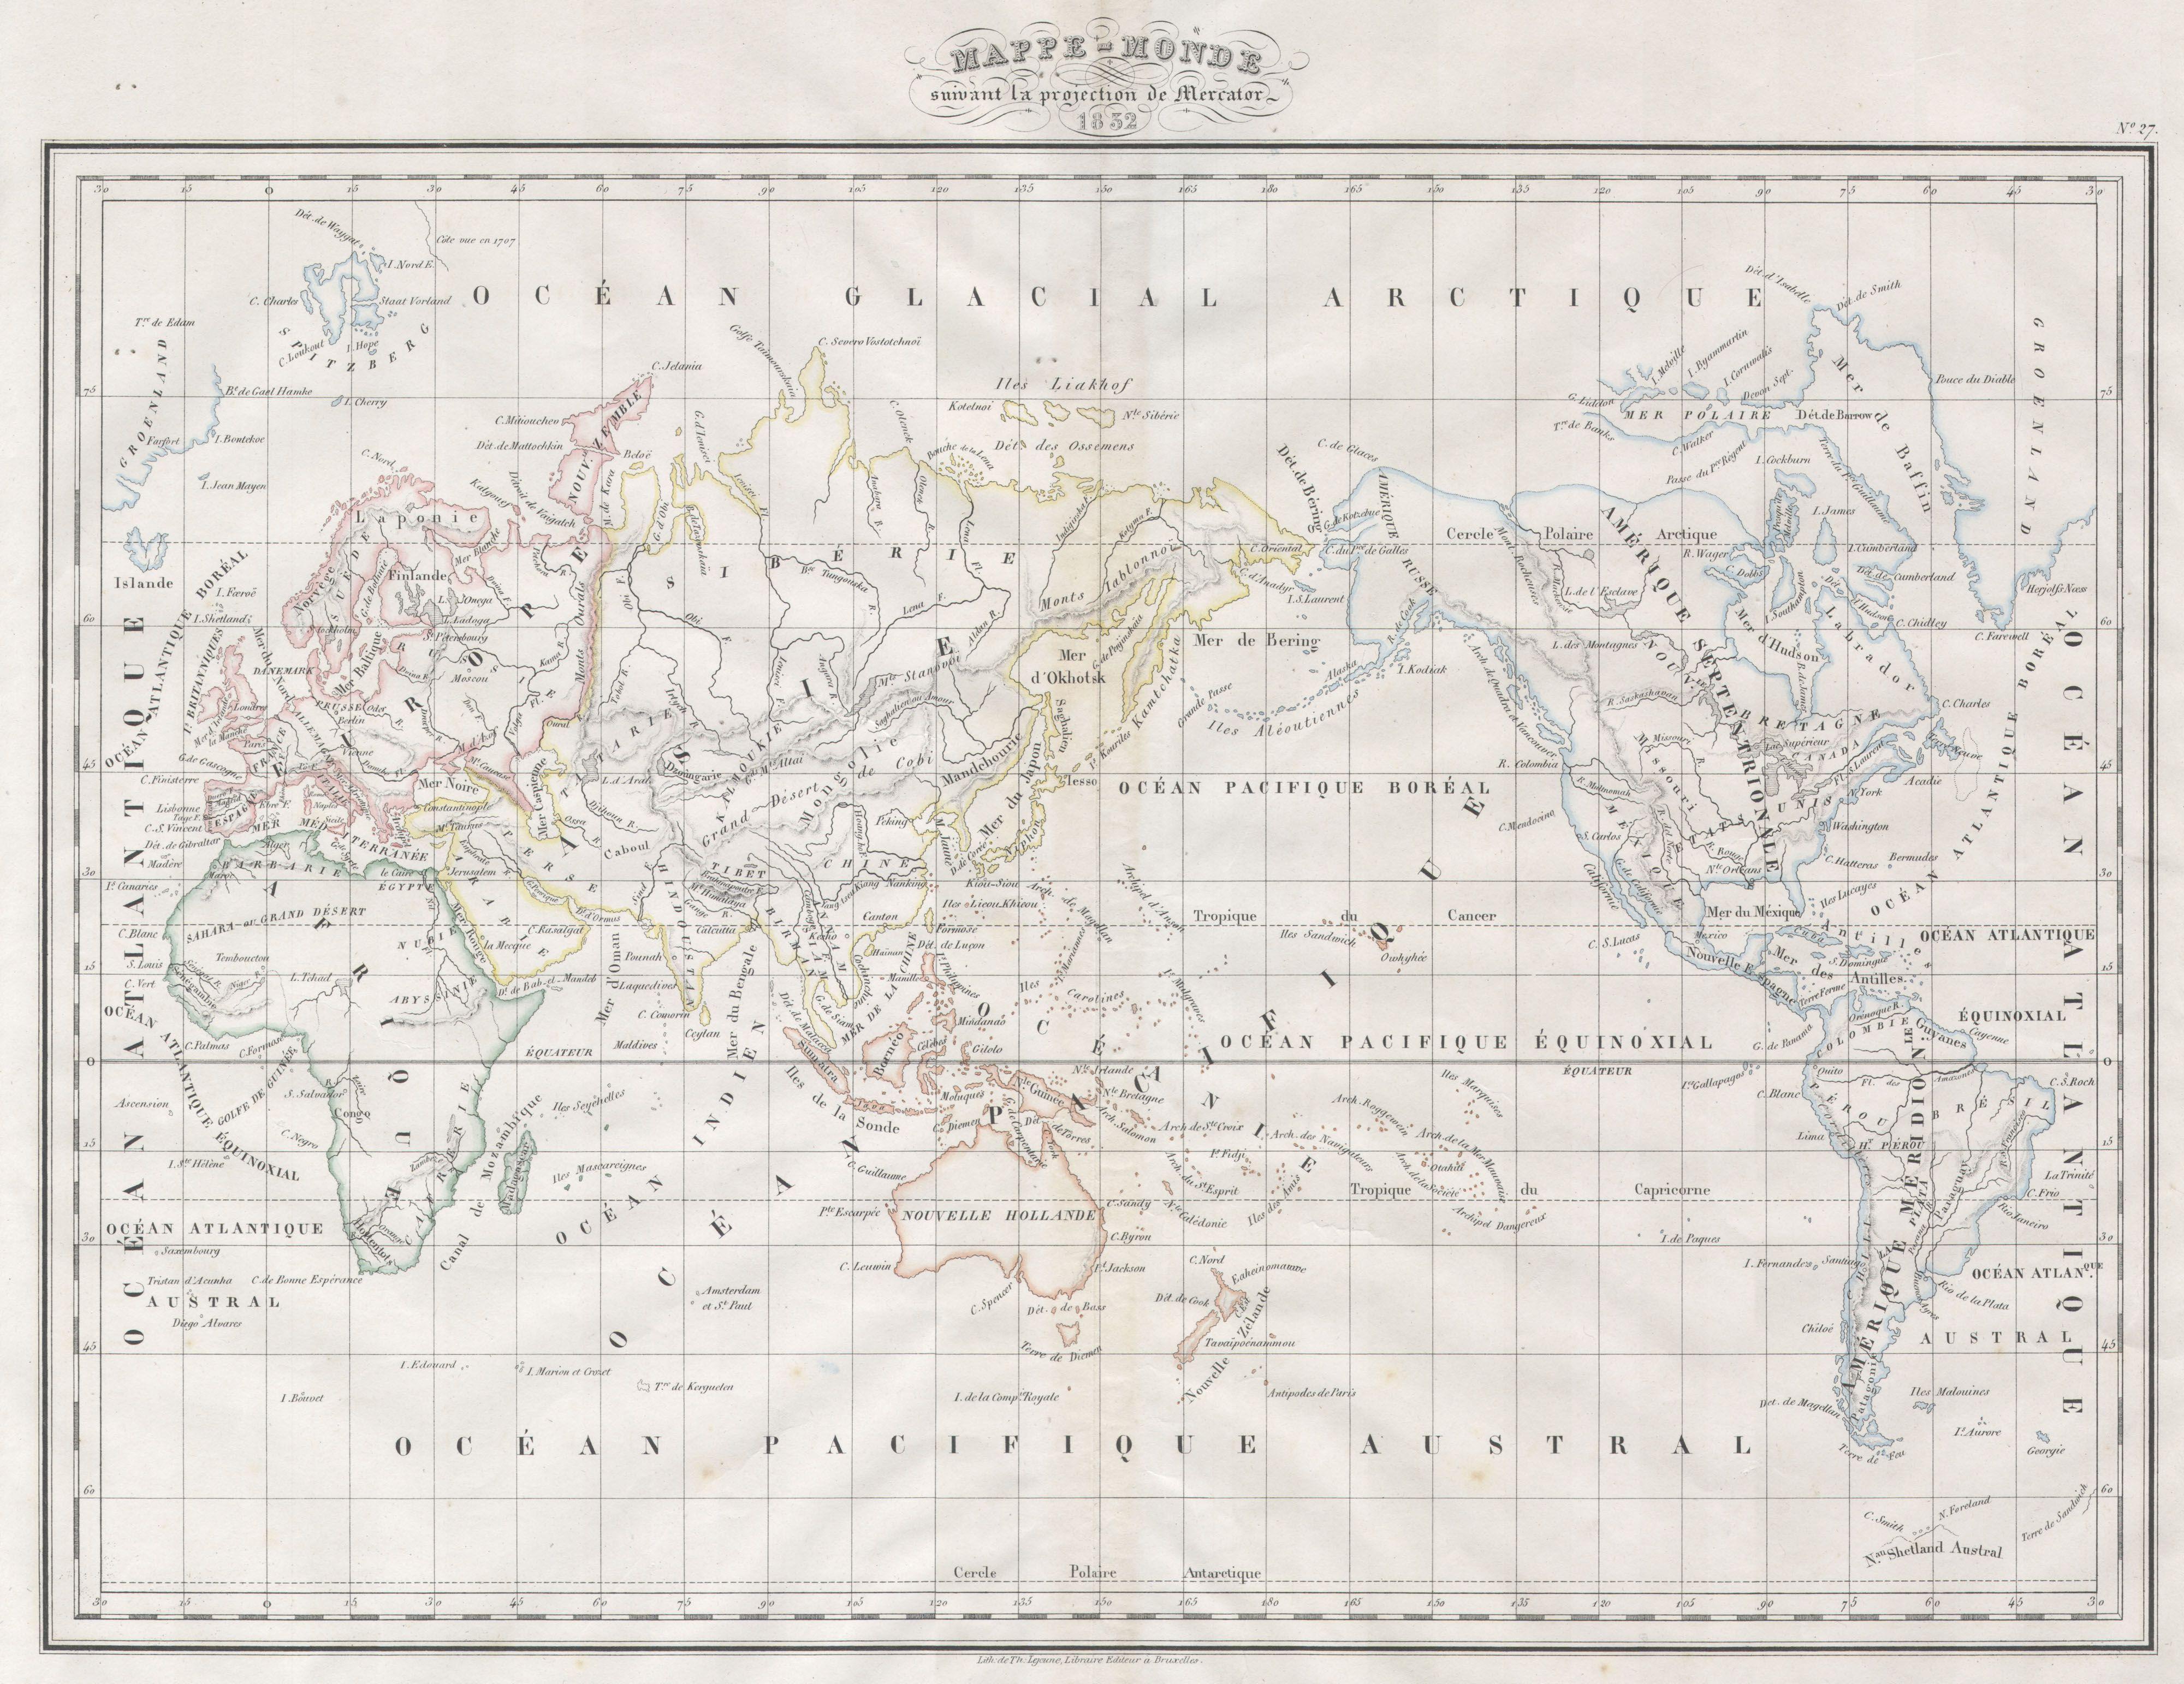 1832 Malte Brun Map of the World on Mercator Projection, via wikipedia